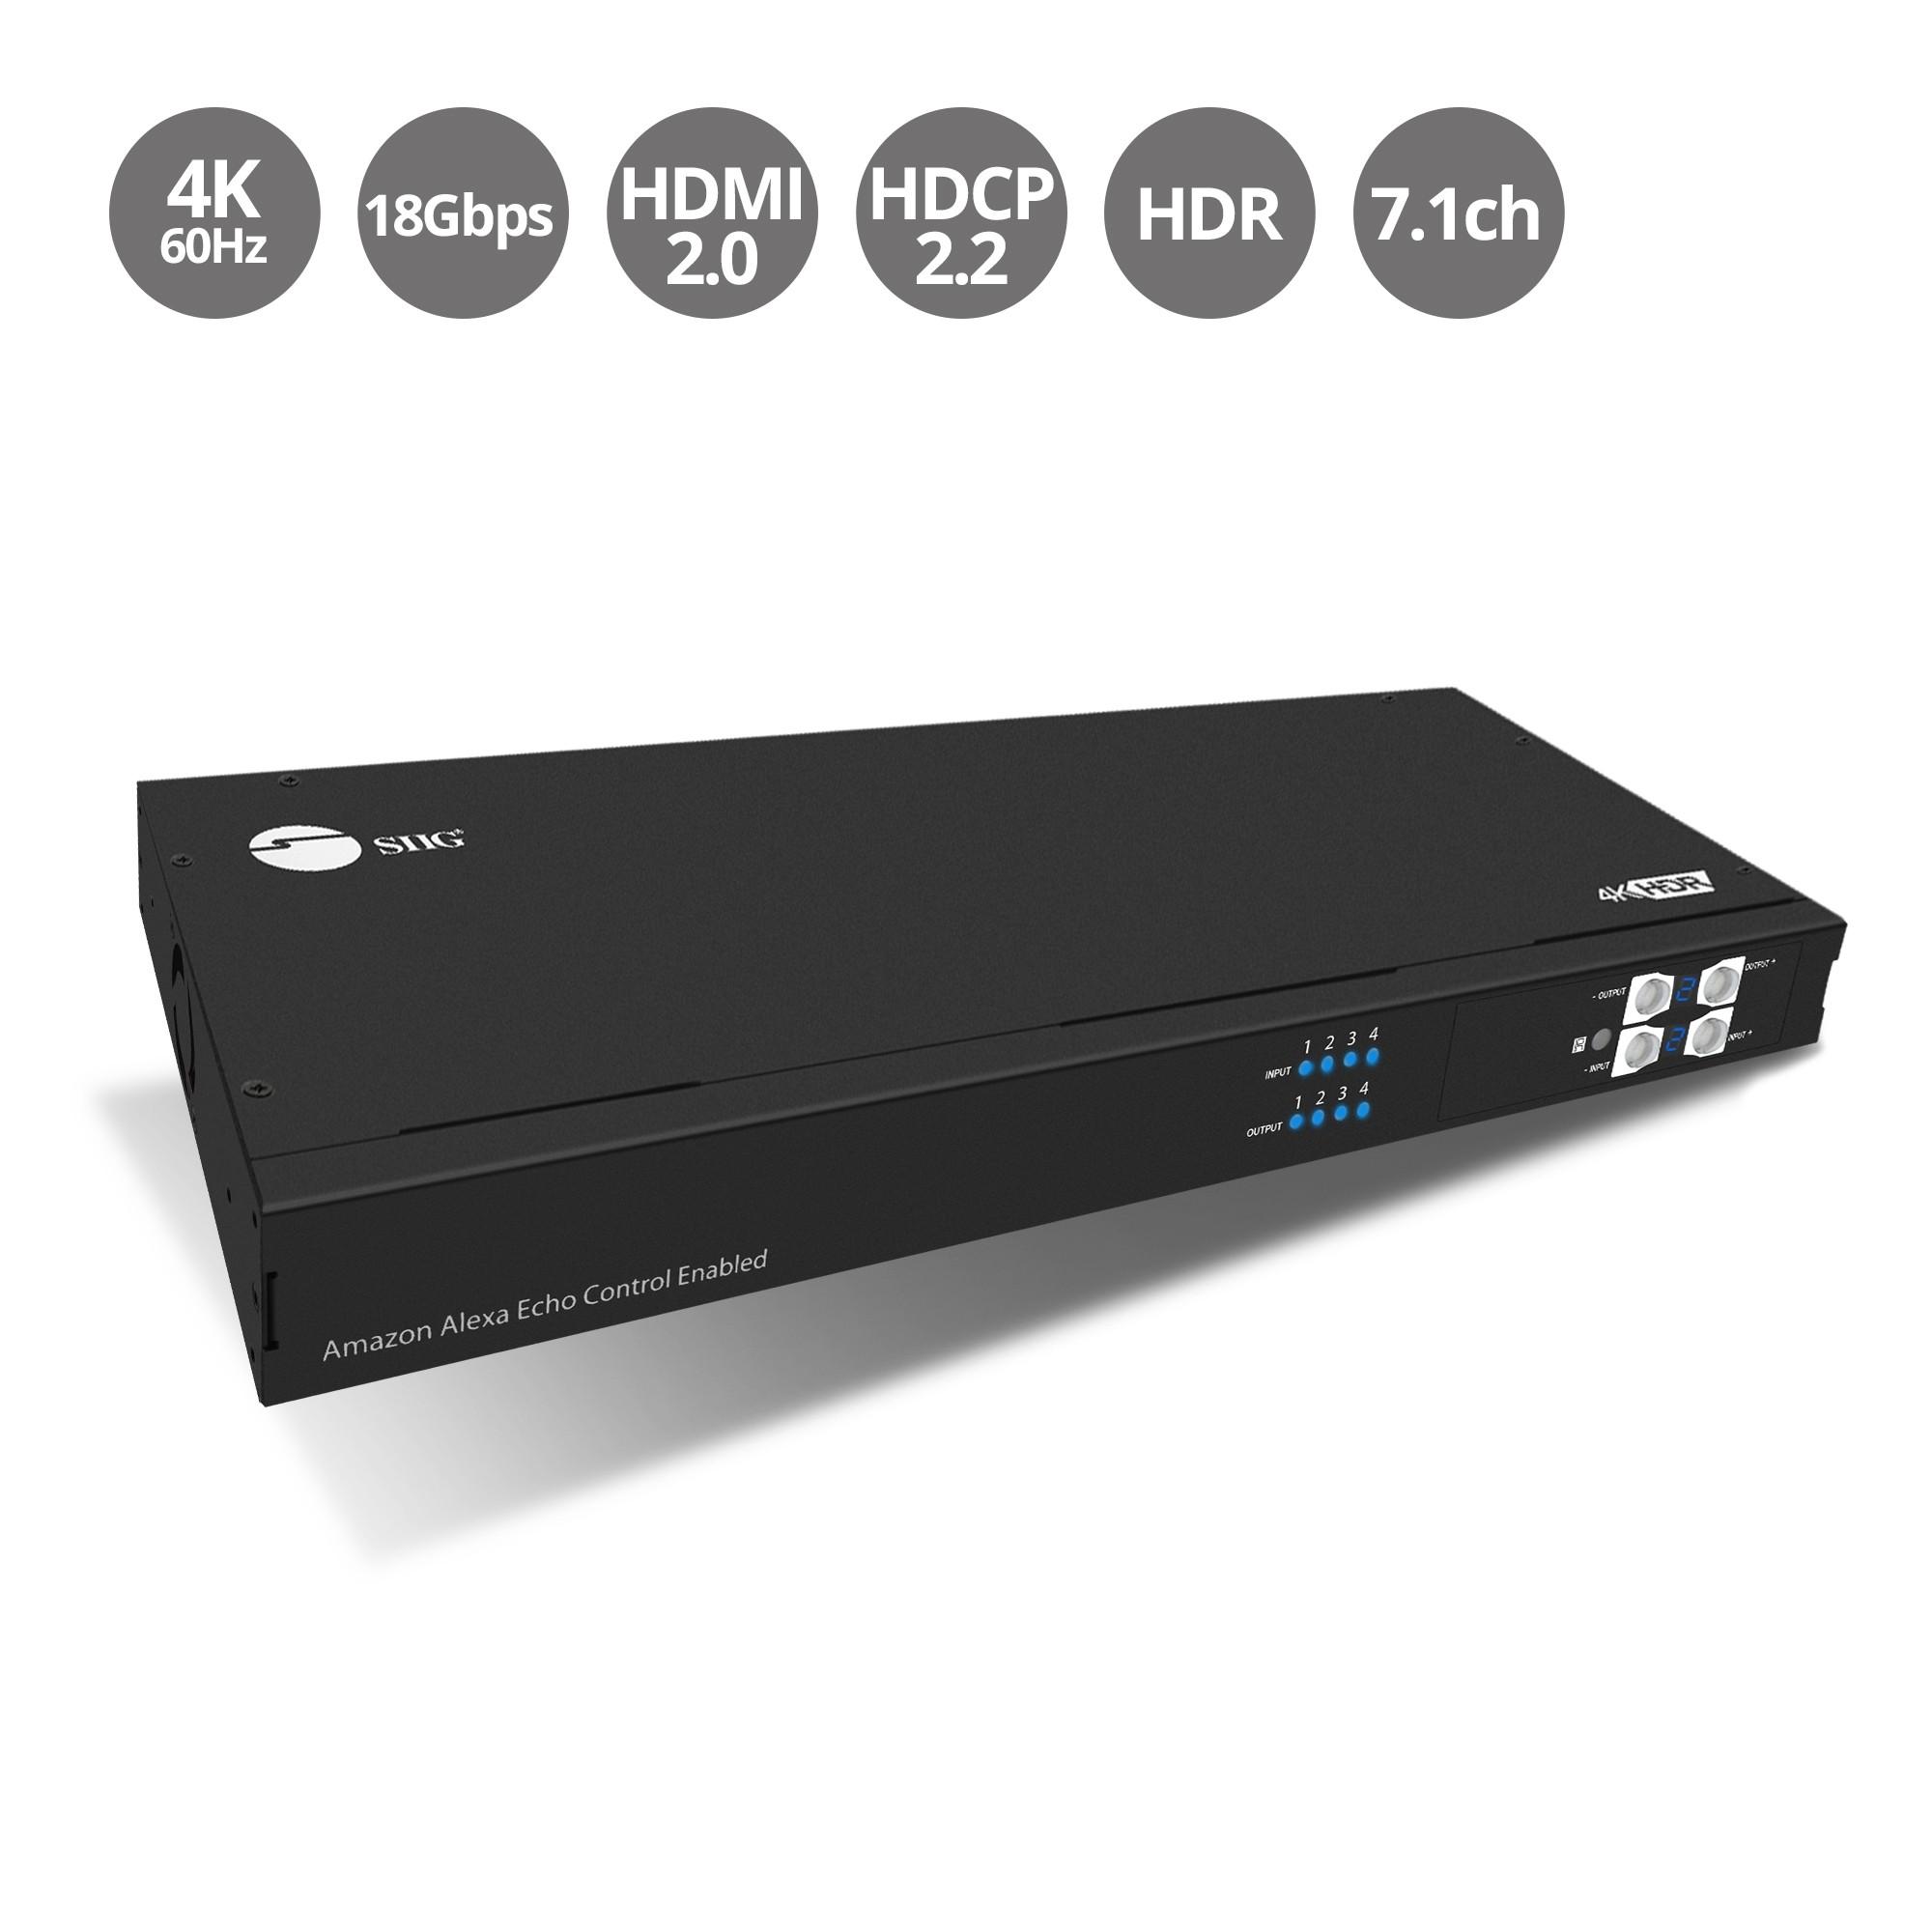 HDMI 2.0 4x4 Matrix with Amazon Echo Control Enabled